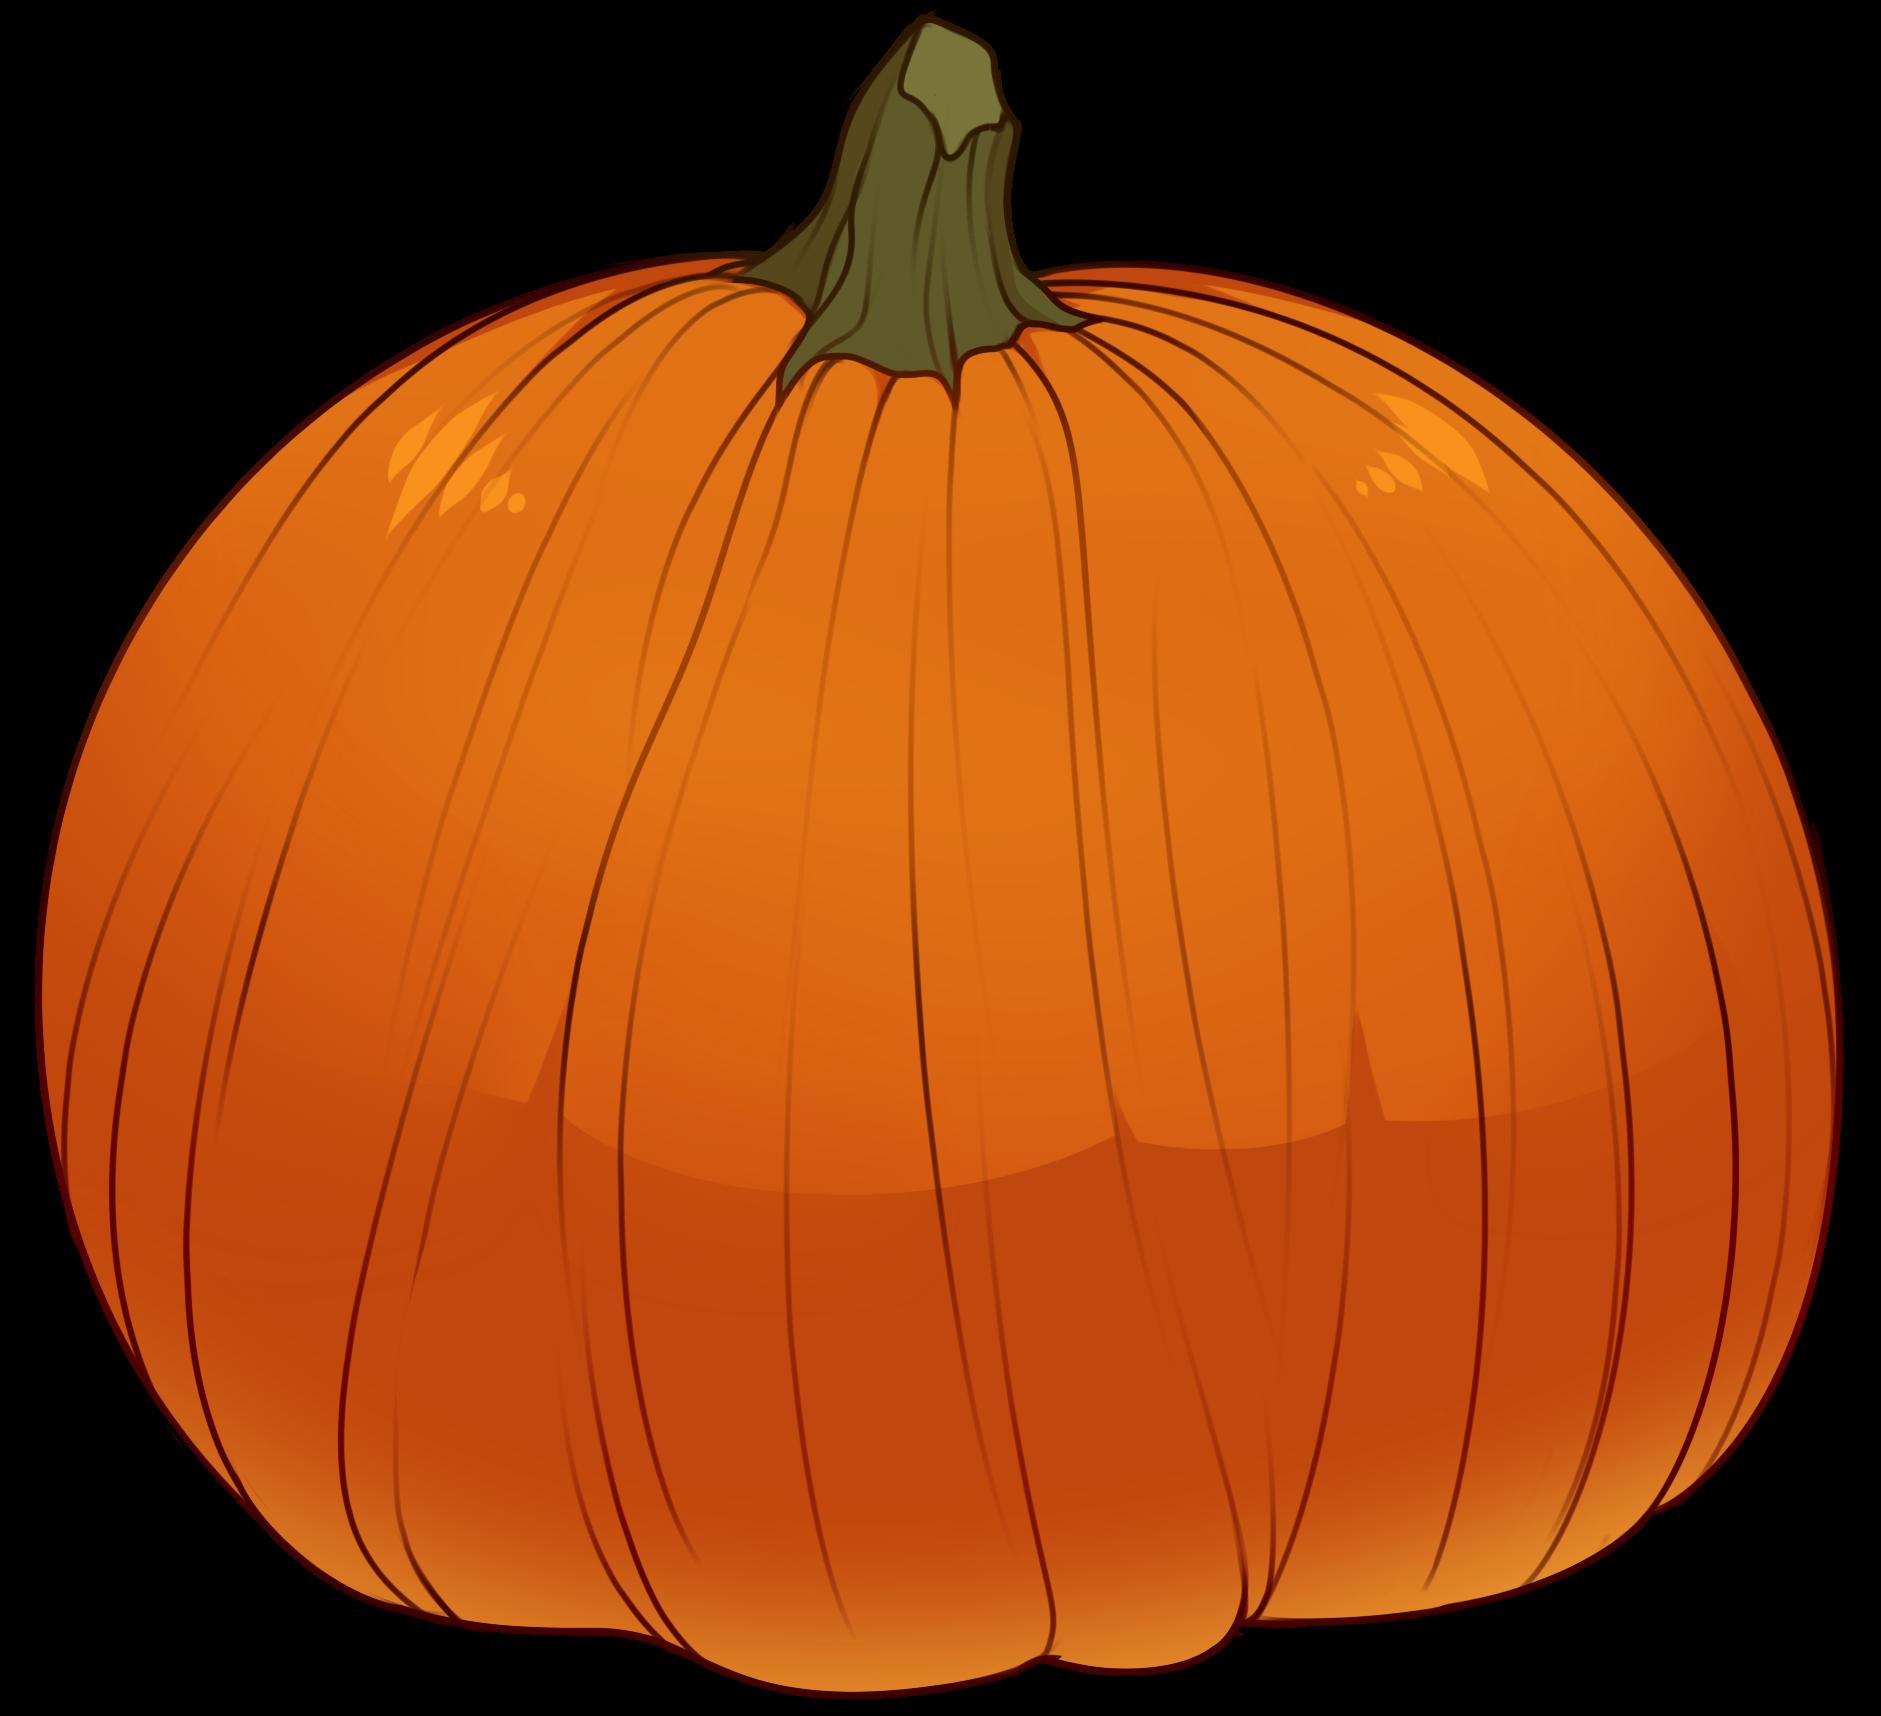 Pumpkin_Large.png